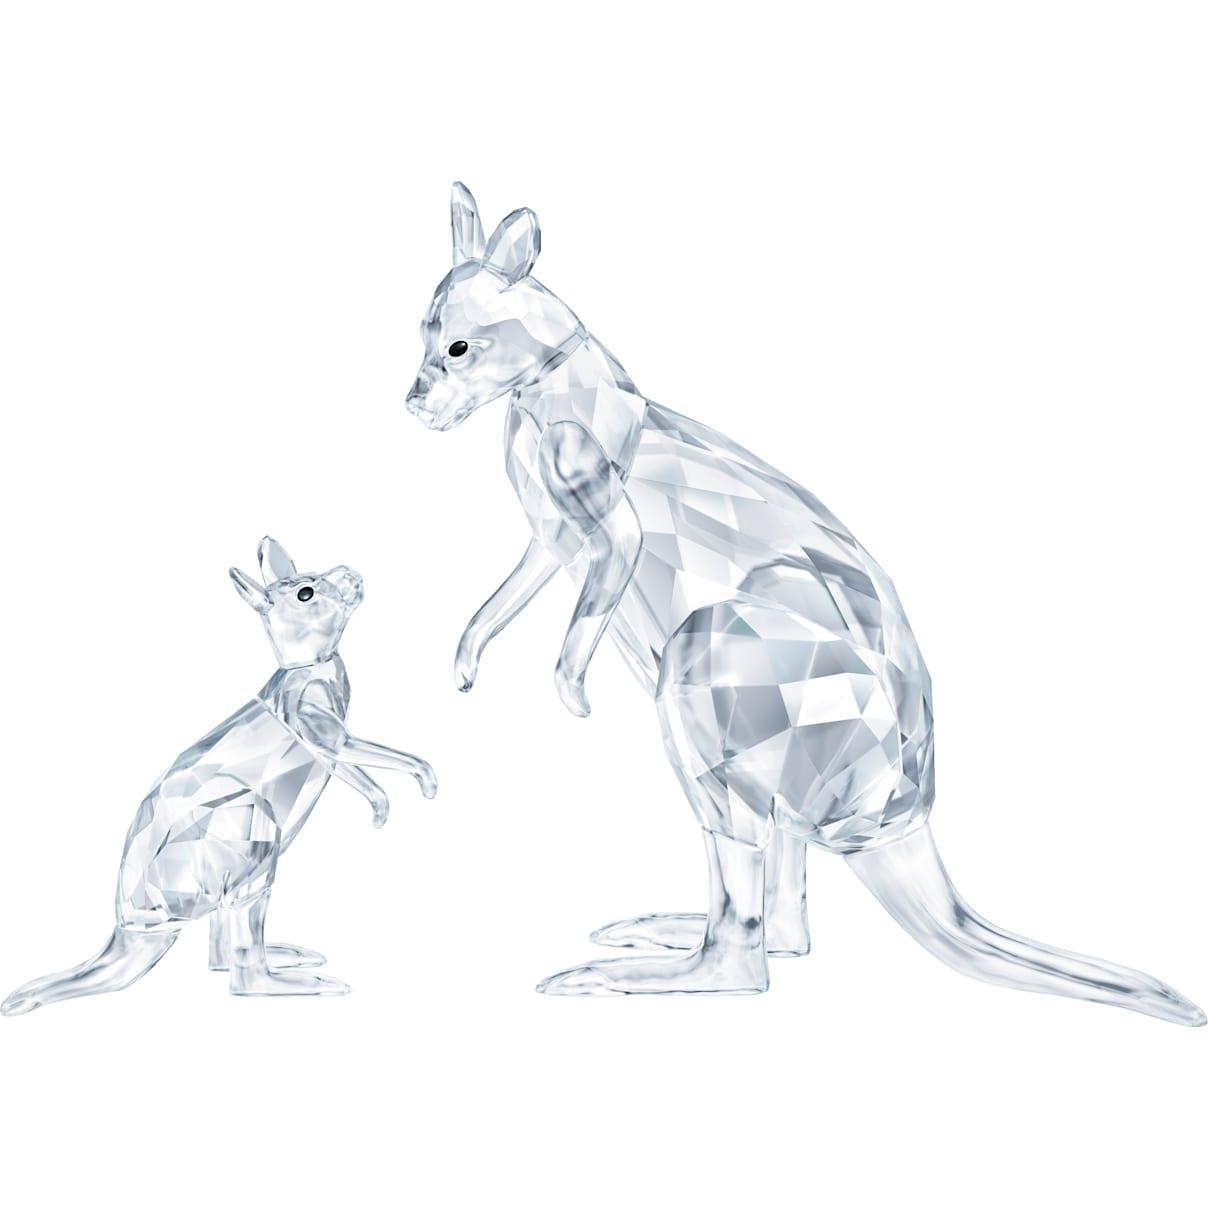 Swarovski Kangaroo Mother with Baby